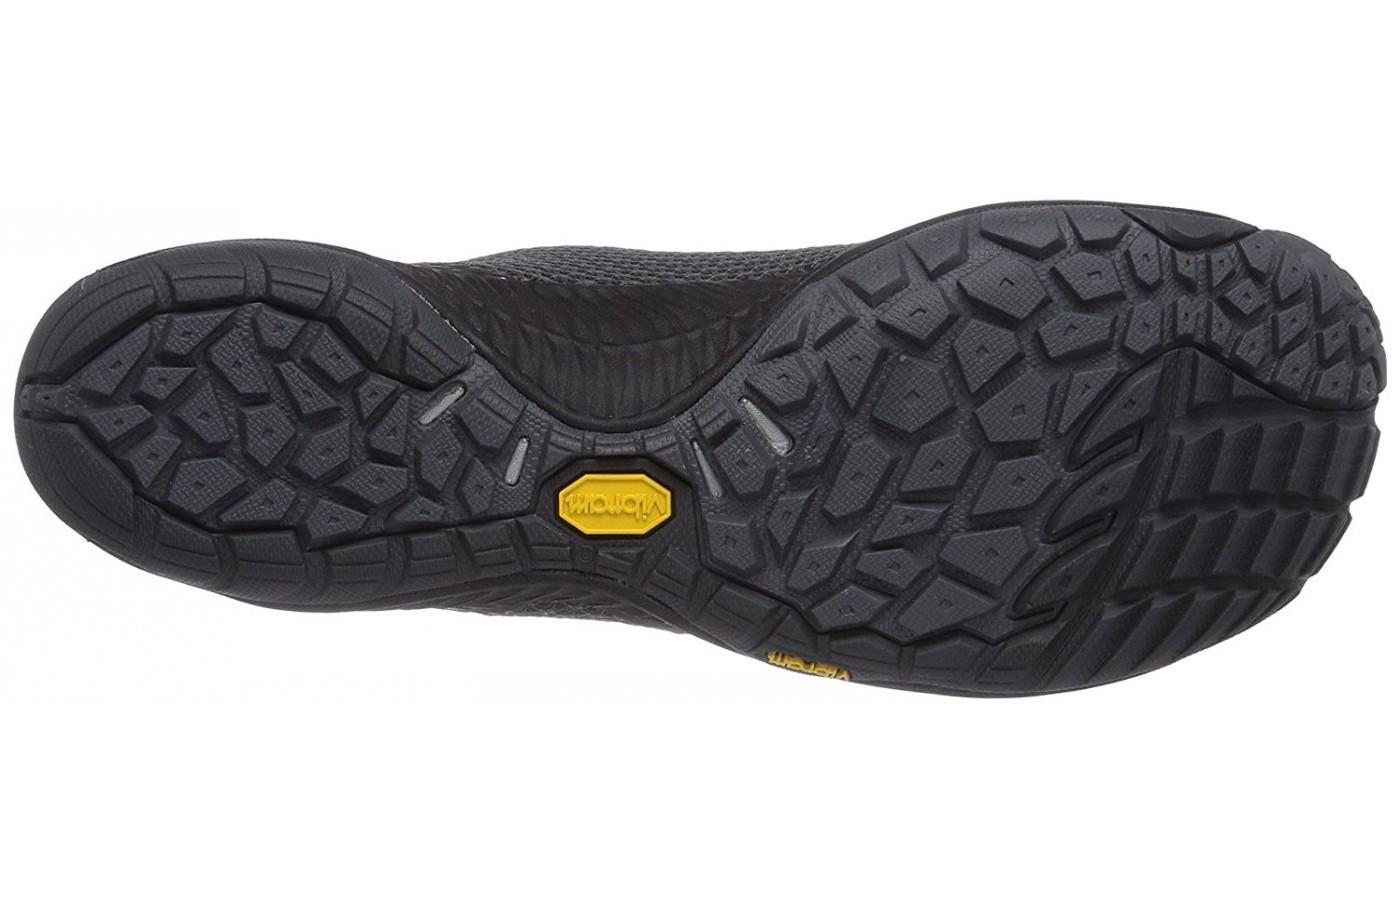 Pace Glove sole